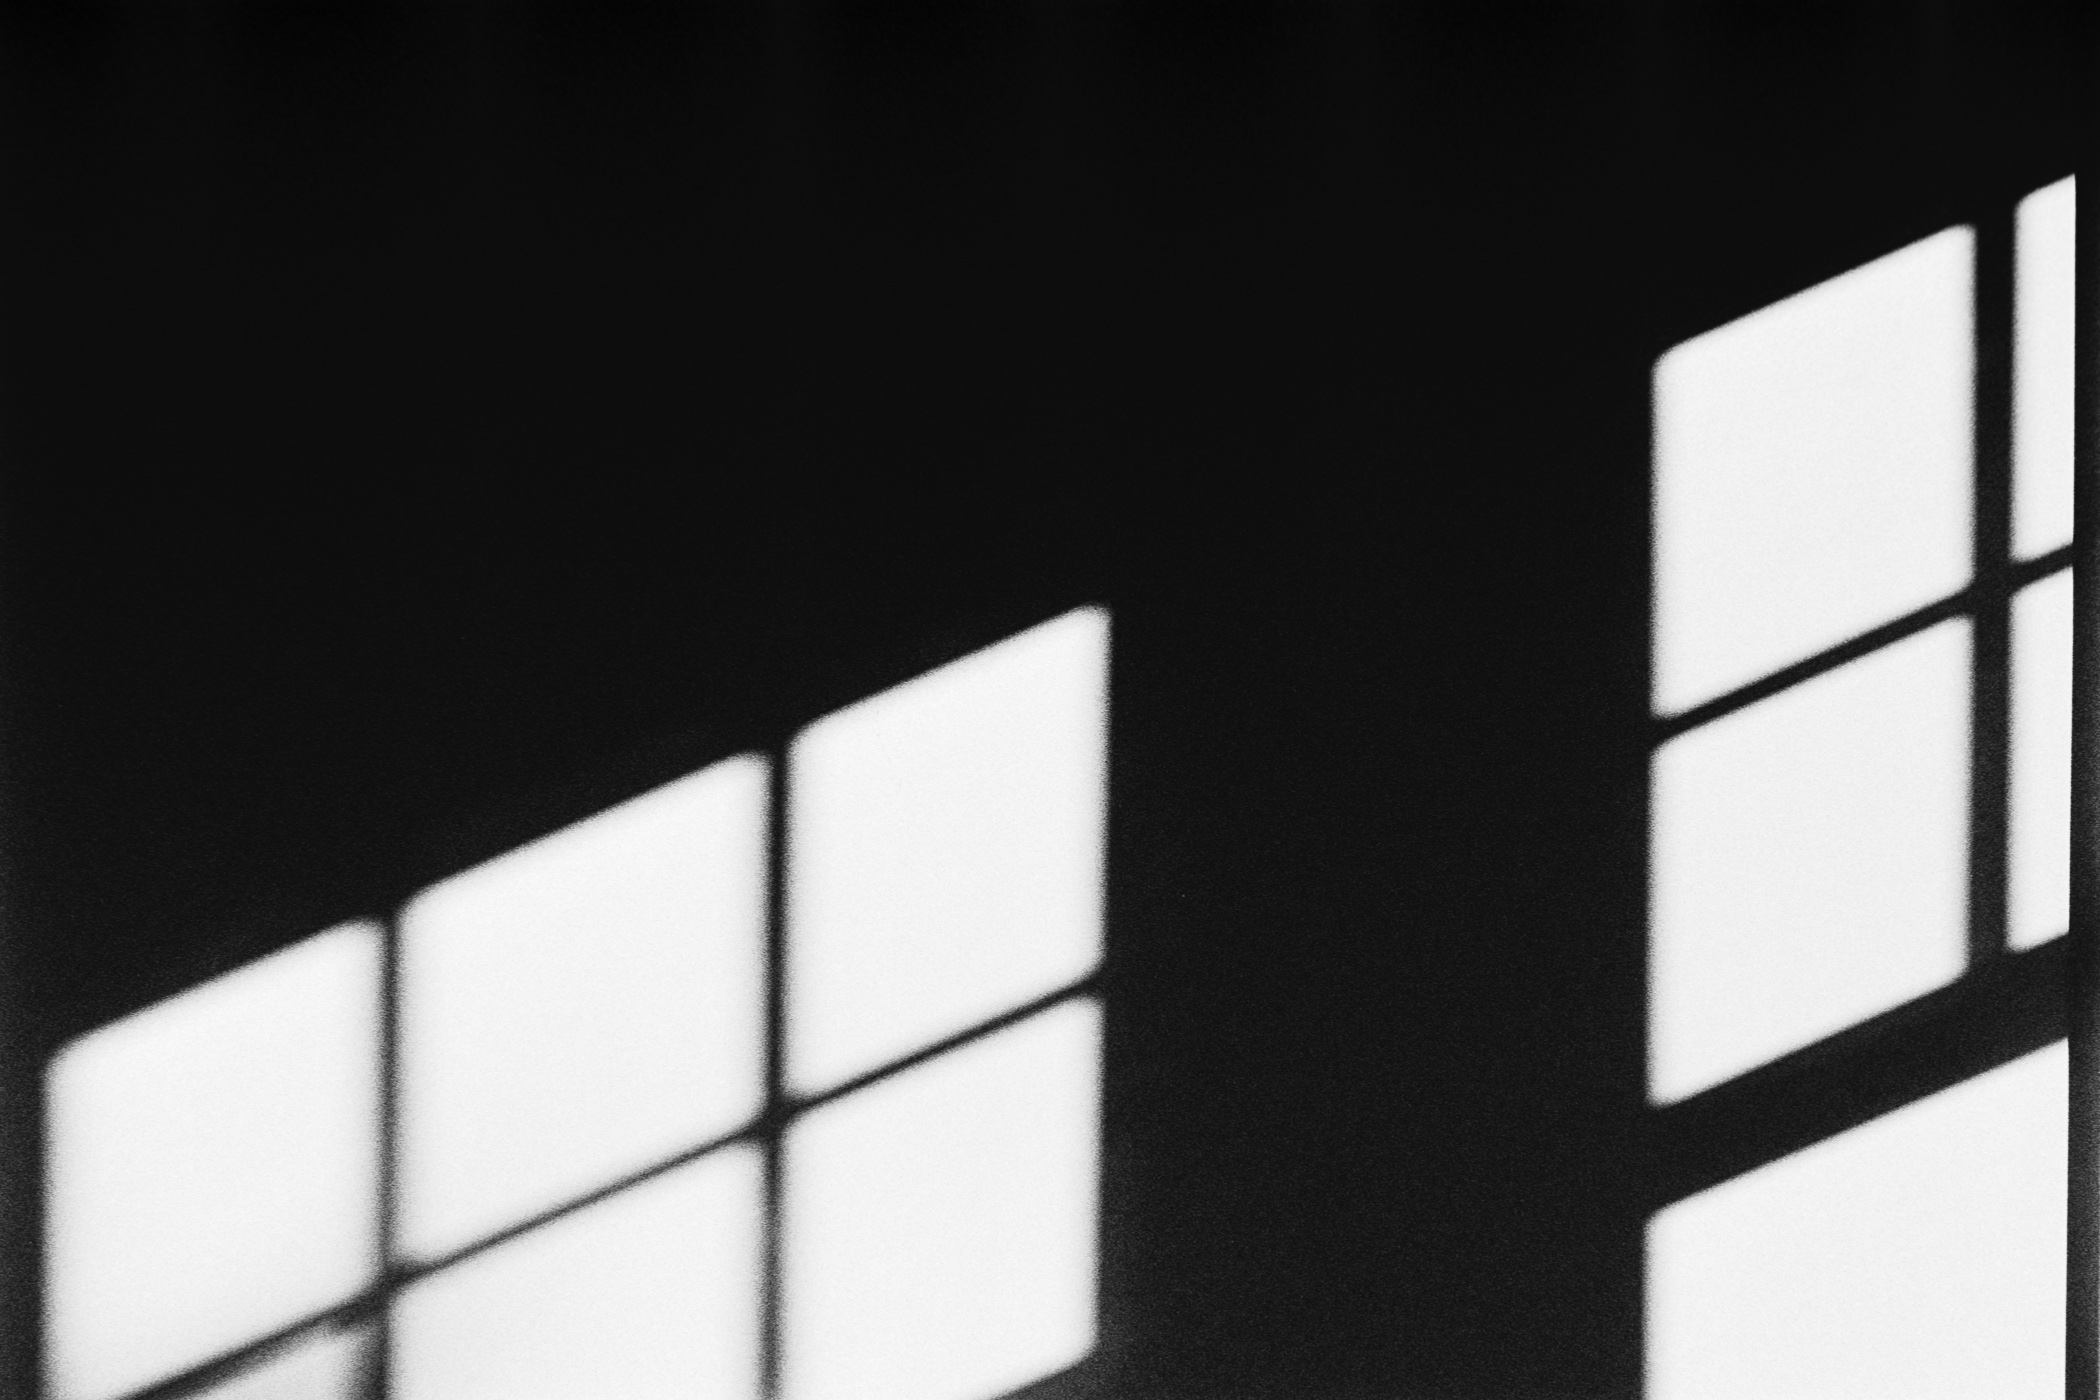 shadows created by windows